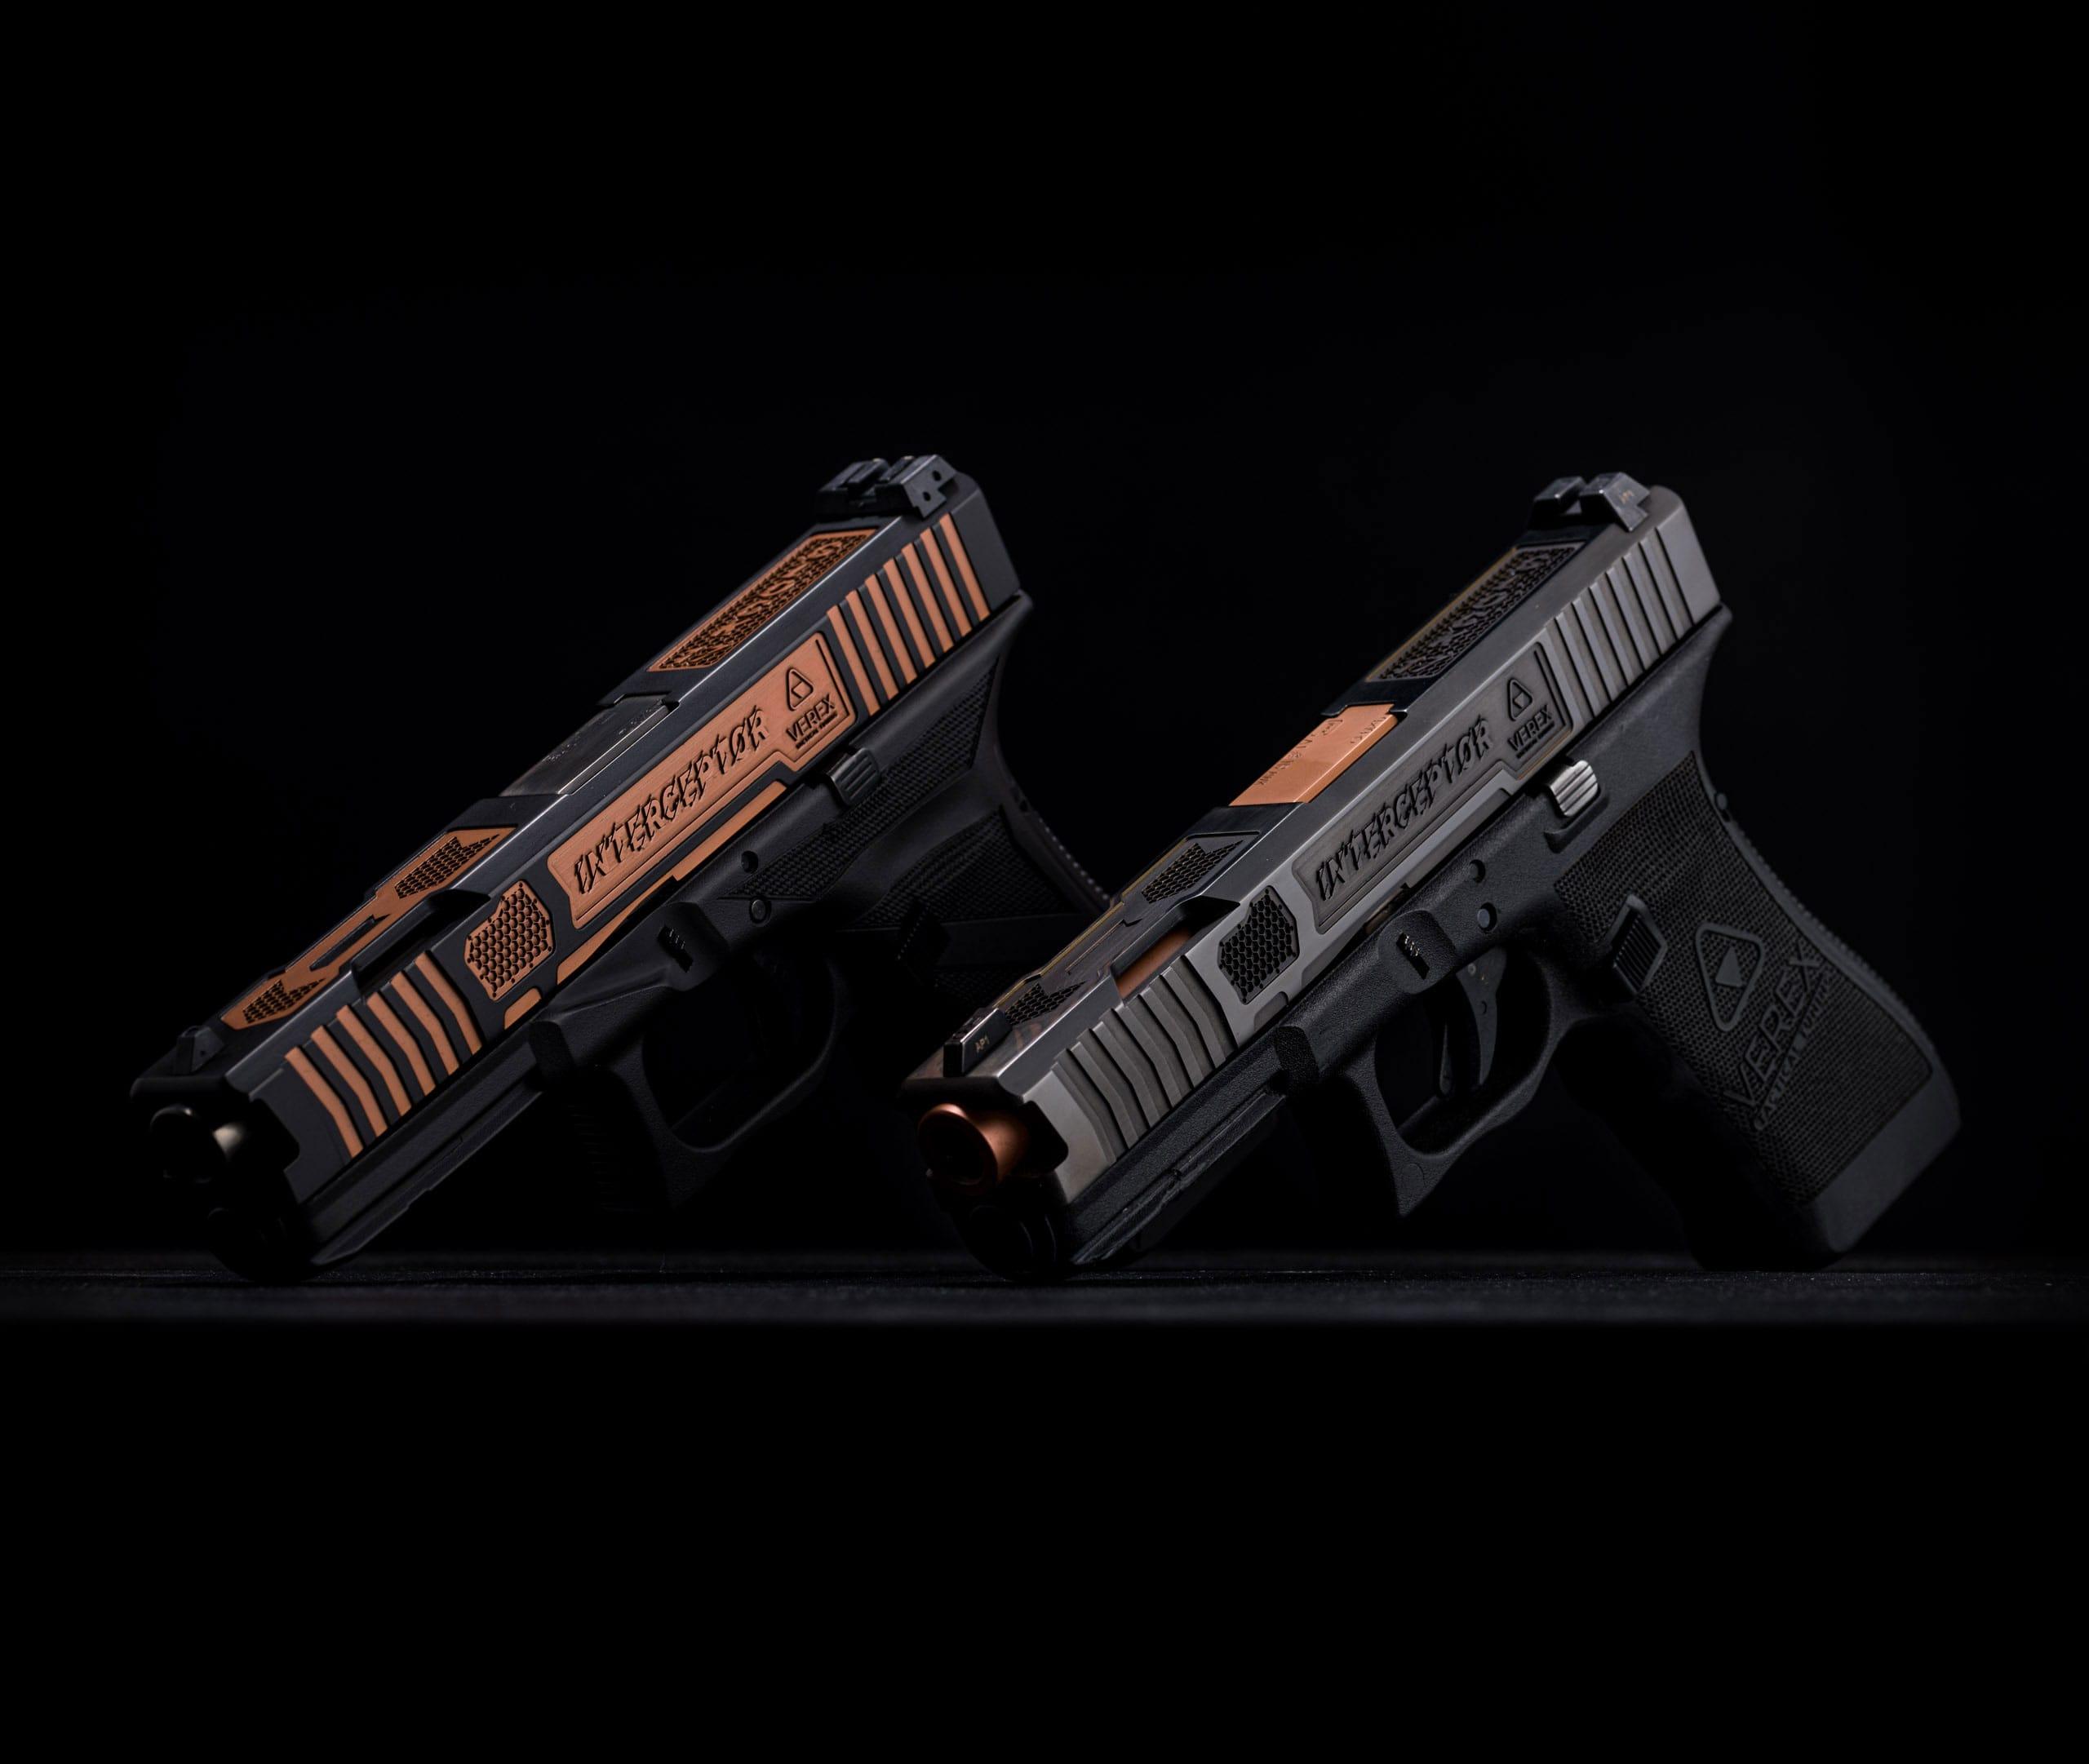 waffe-bearbeiten-lassen-einfräsungen-tuningteile-für-pistolen-neubeschichtung-schlitten-fräsen-verex-tactical